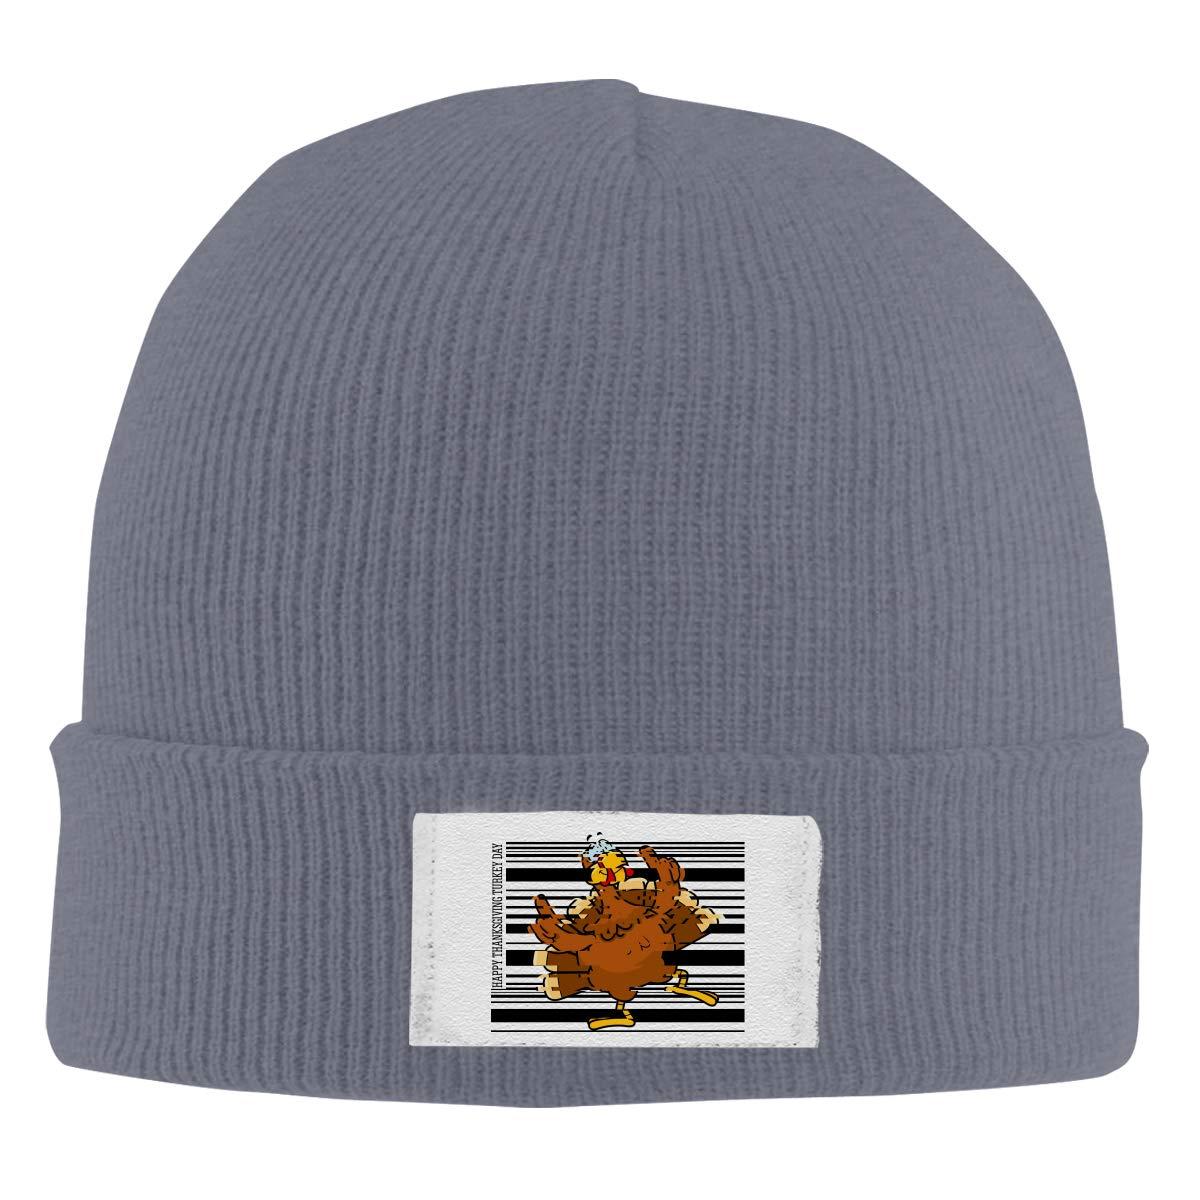 Dunpaiaa Skull Caps Happy Thanksgiving Turkey Day Winter Warm Knit Hats Stretchy Cuff Beanie Hat Black